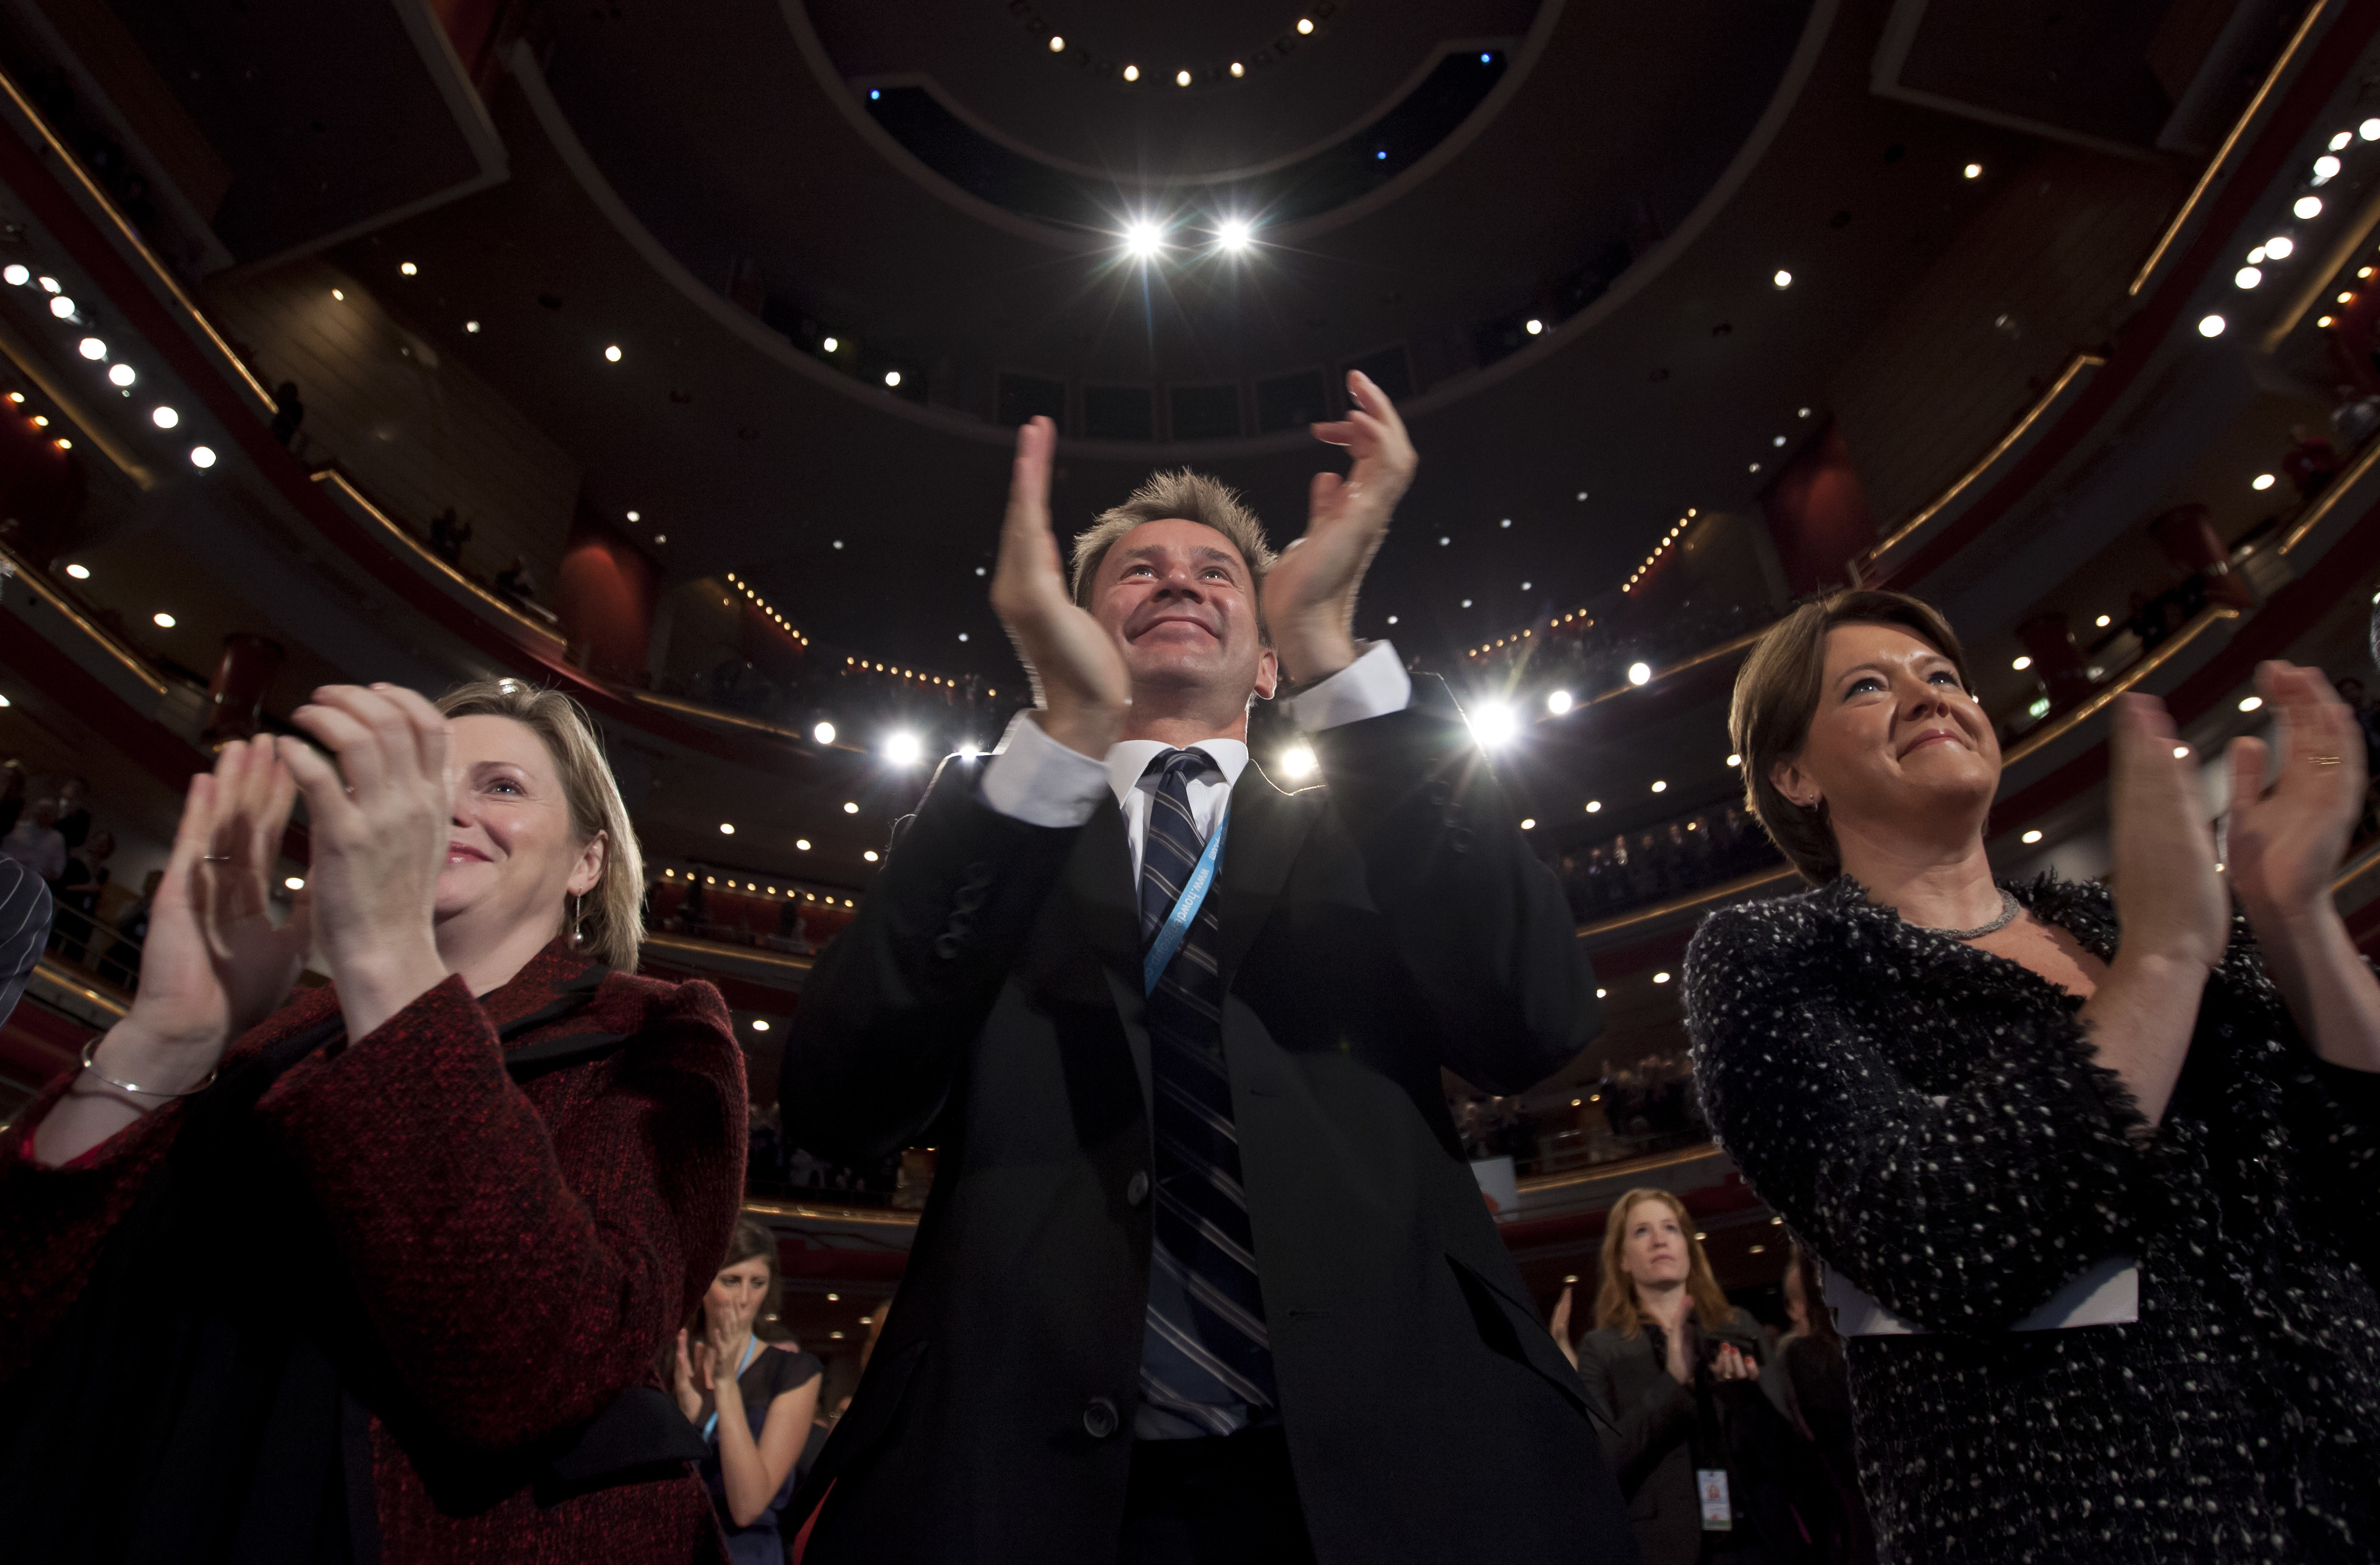 Фото © AP Photo/Jon Super